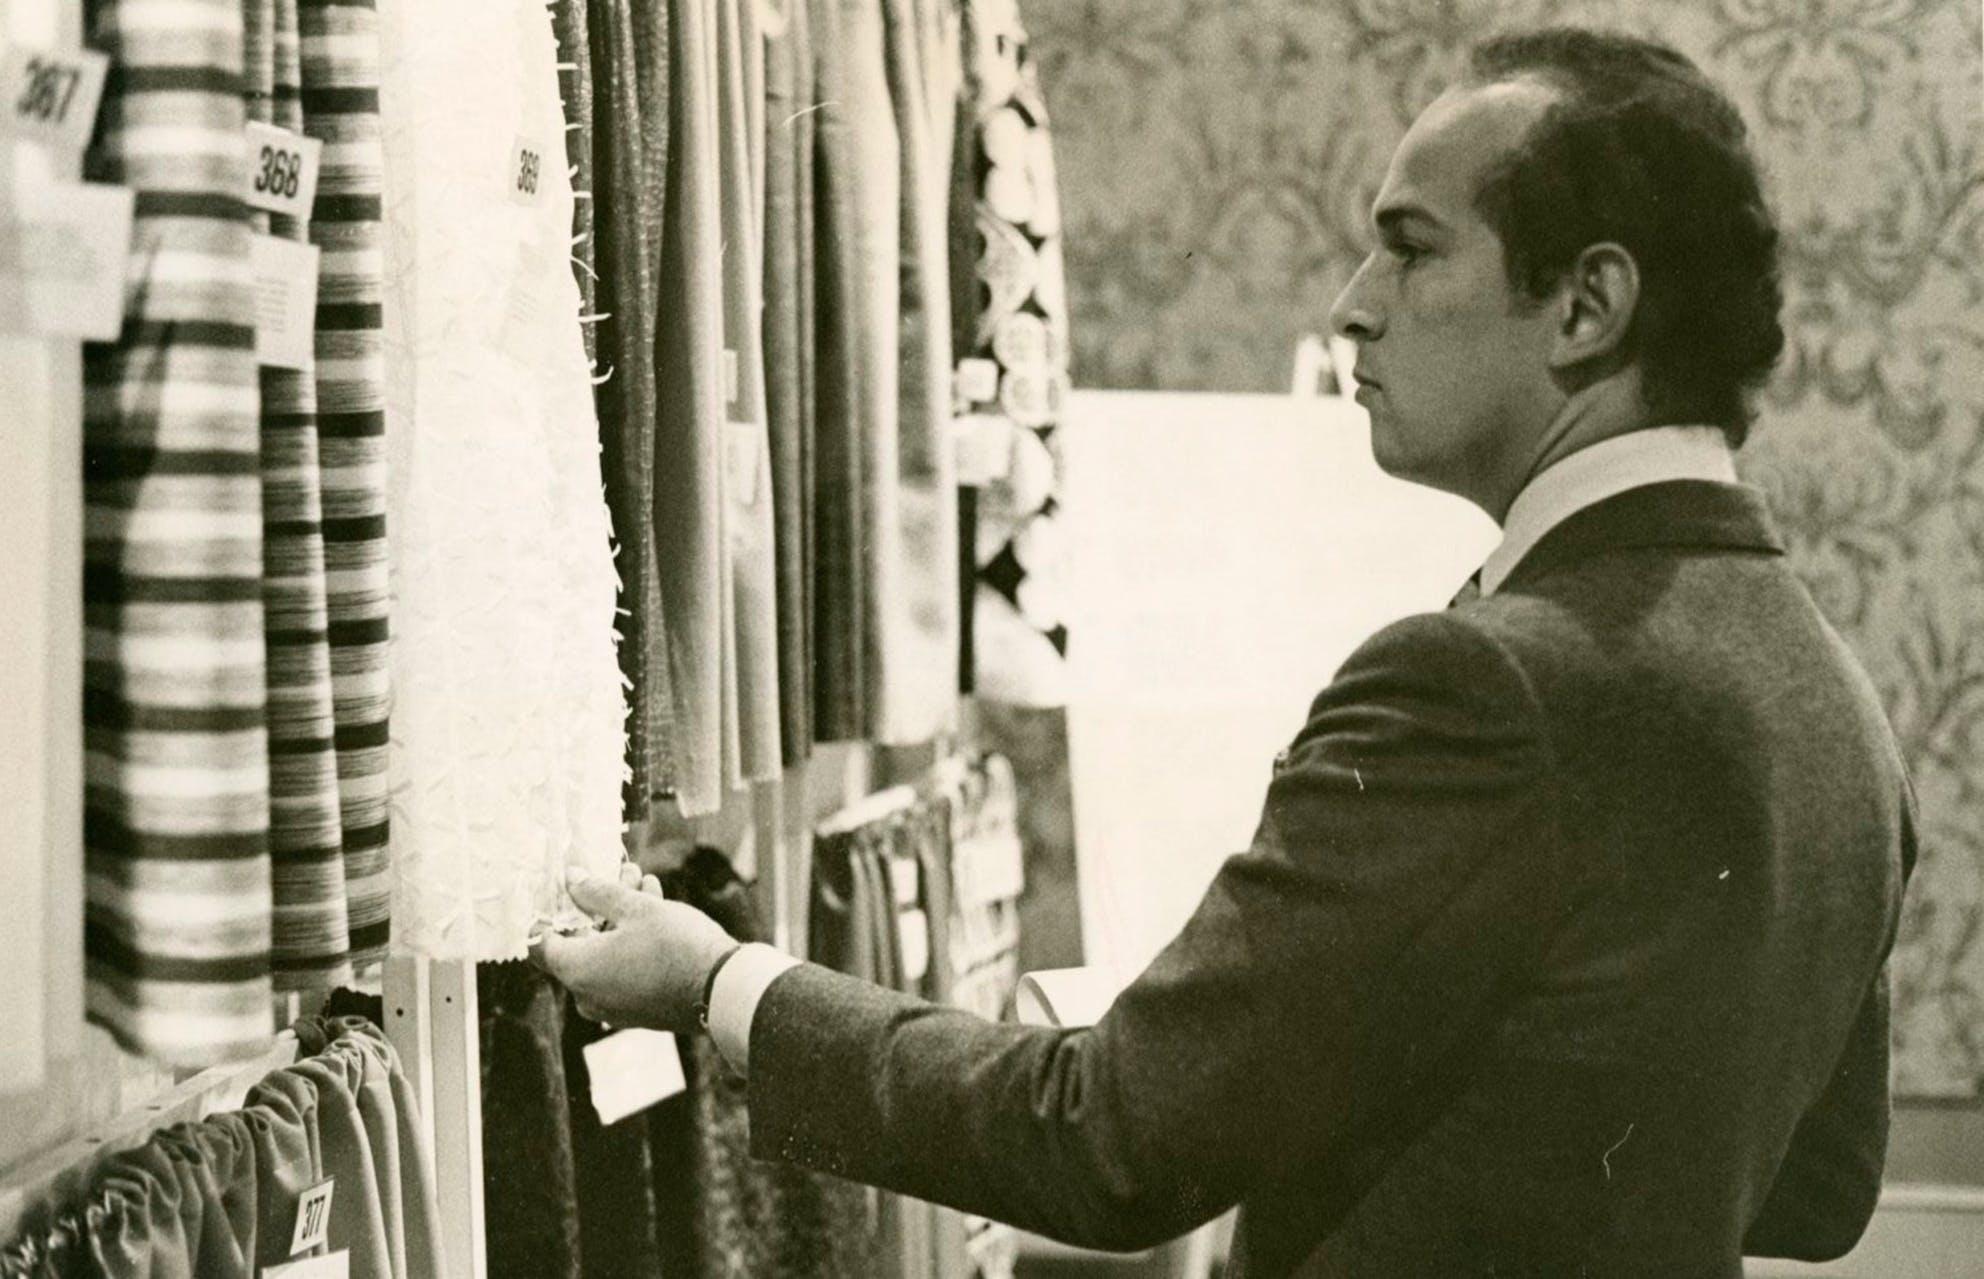 Oscar de la Renta, bậc thầy thiết kế áo cưới - 1